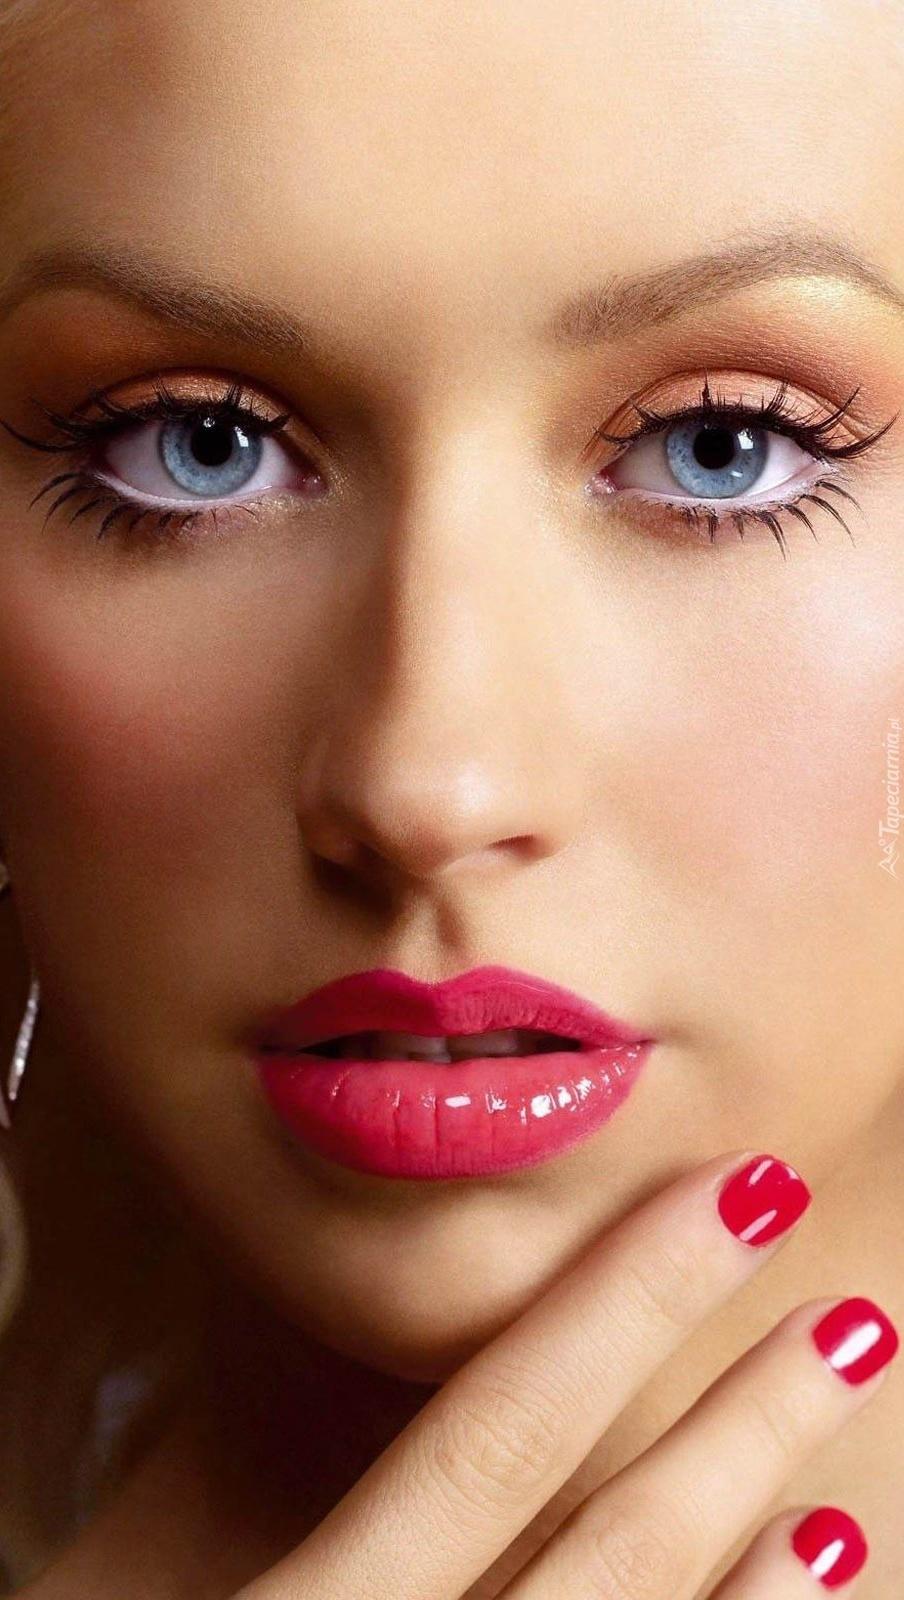 Christina Aguilera w delikatnym makijażu